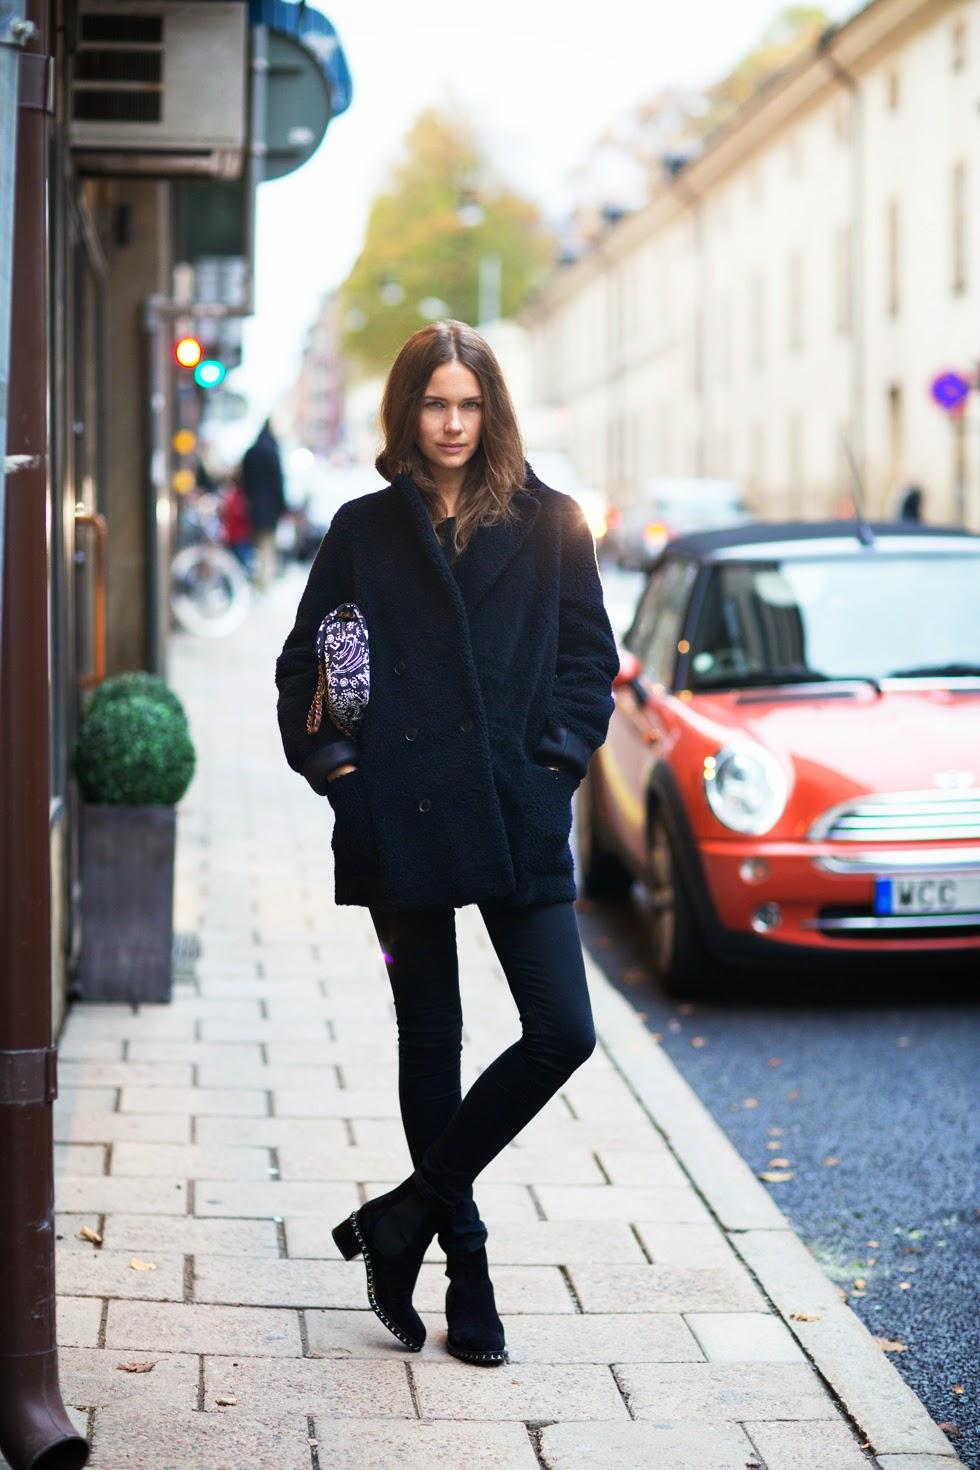 Amato Stivaletti Beatles: outfits e abbinamenti - Modemoiselle TT69